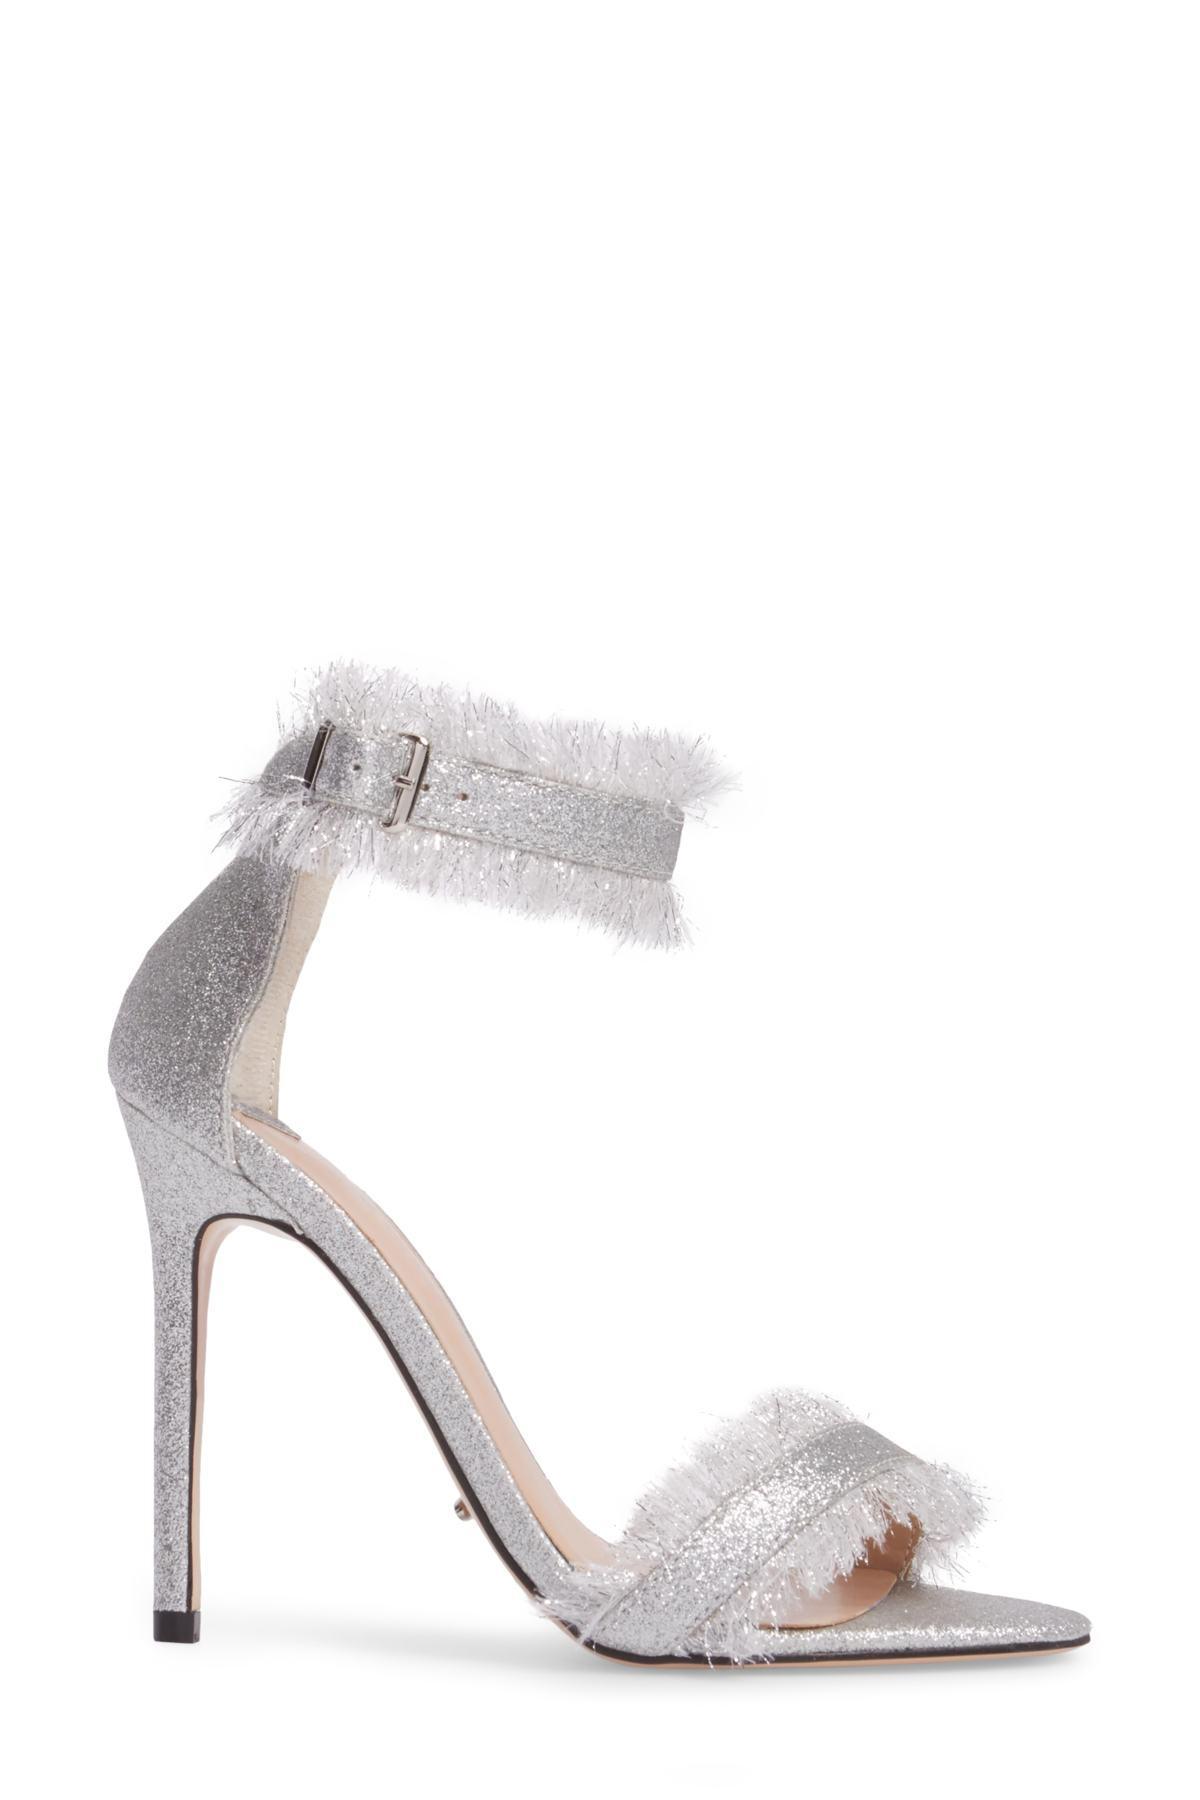 b38a71a71d6 Tony Bianco Kimi Fringed Strappy Sandal (women) in Metallic - Lyst